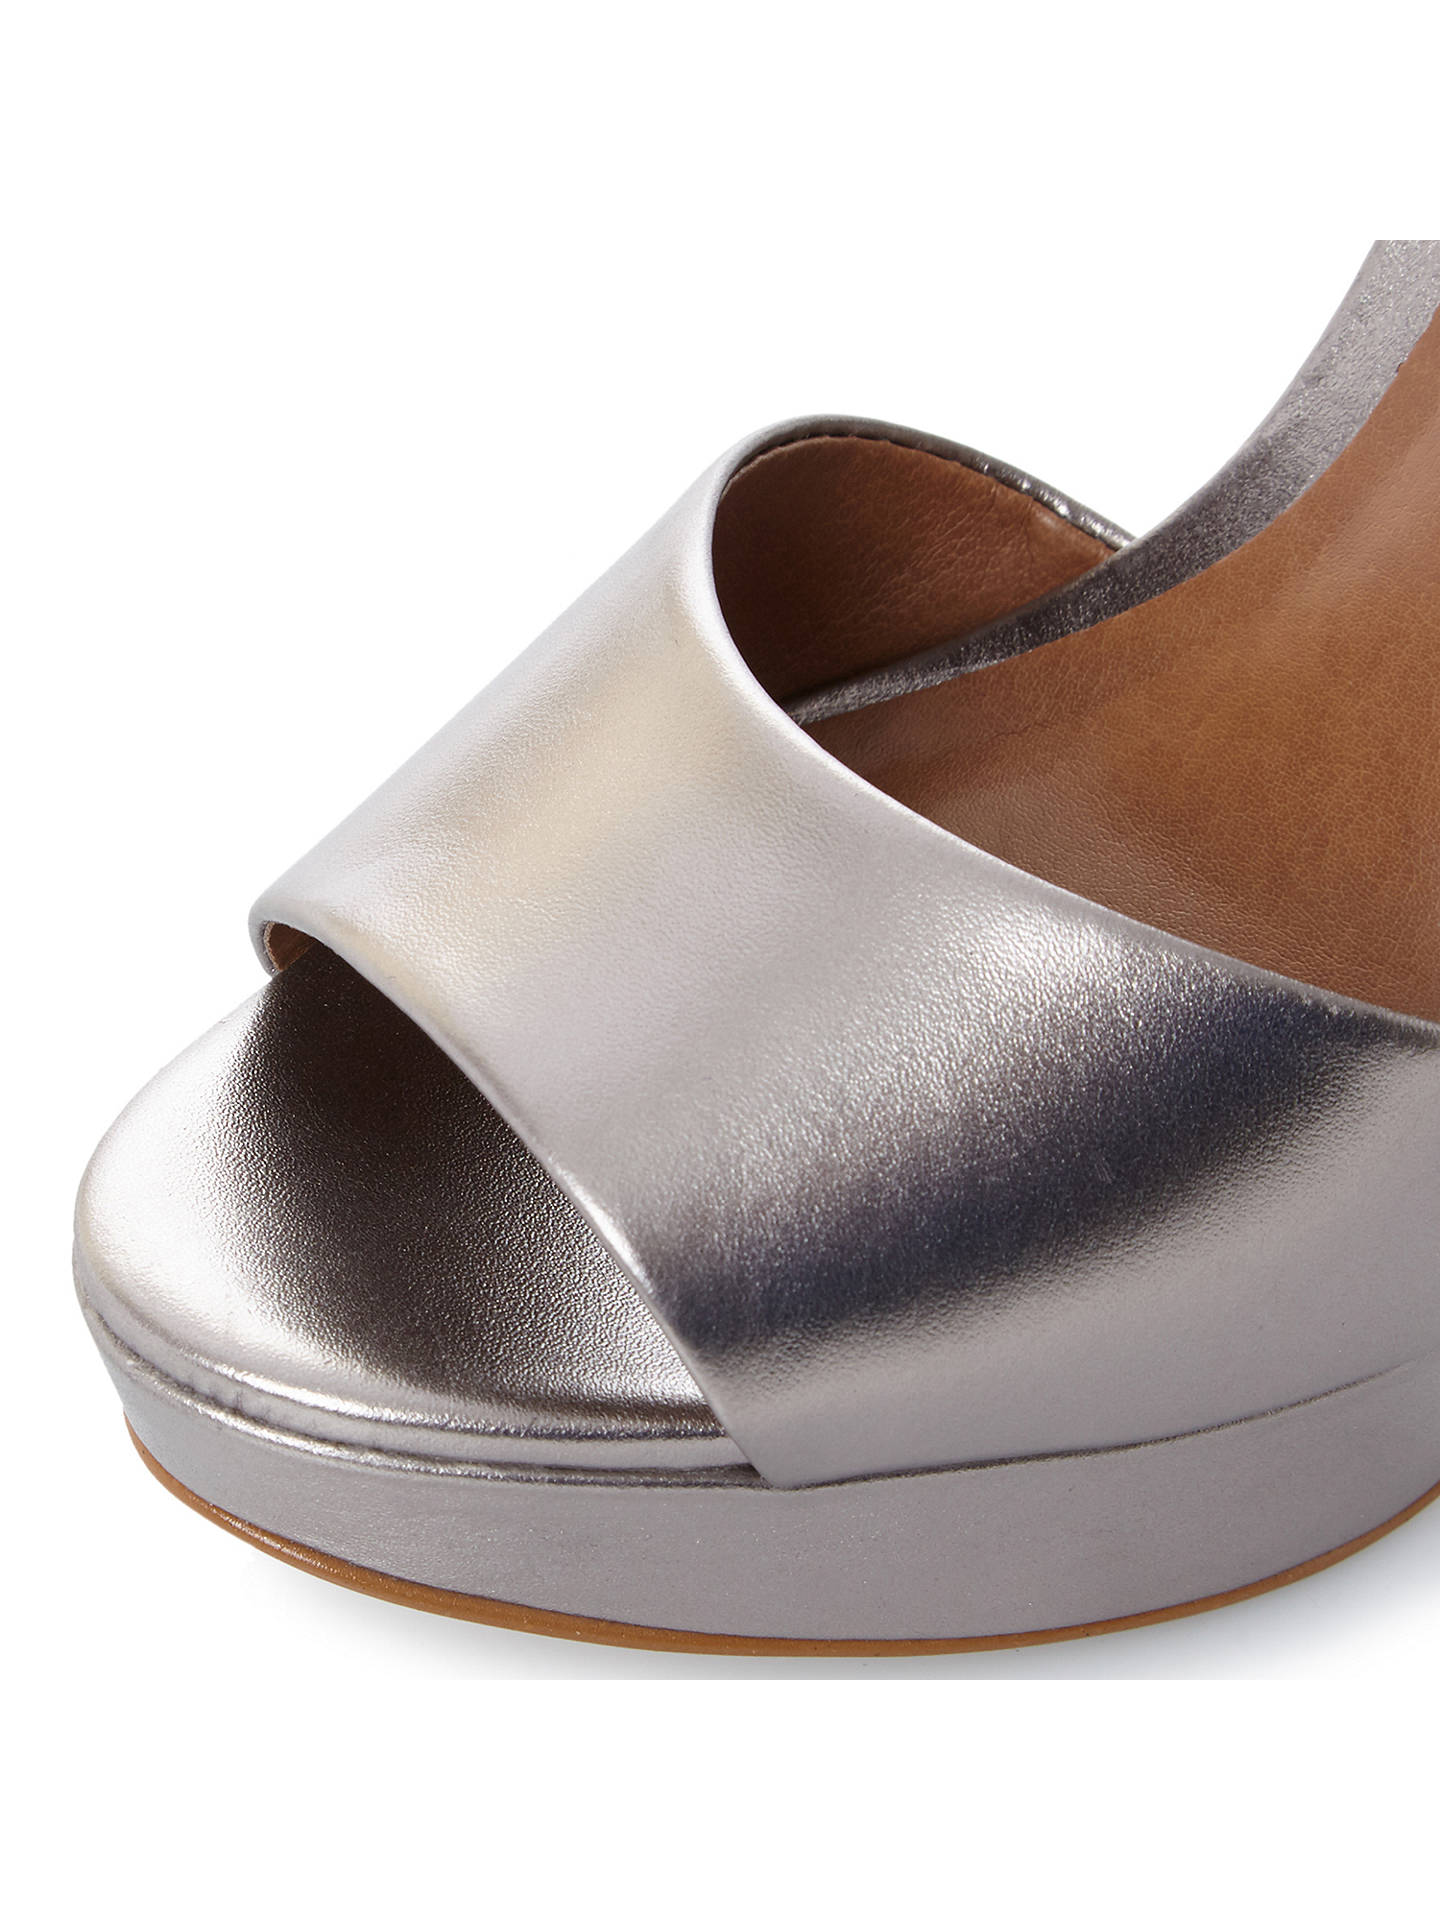 98a6a6f5b90 Steve Madden Kierra Platform Block Heeled Sandals, Pewter at John ...